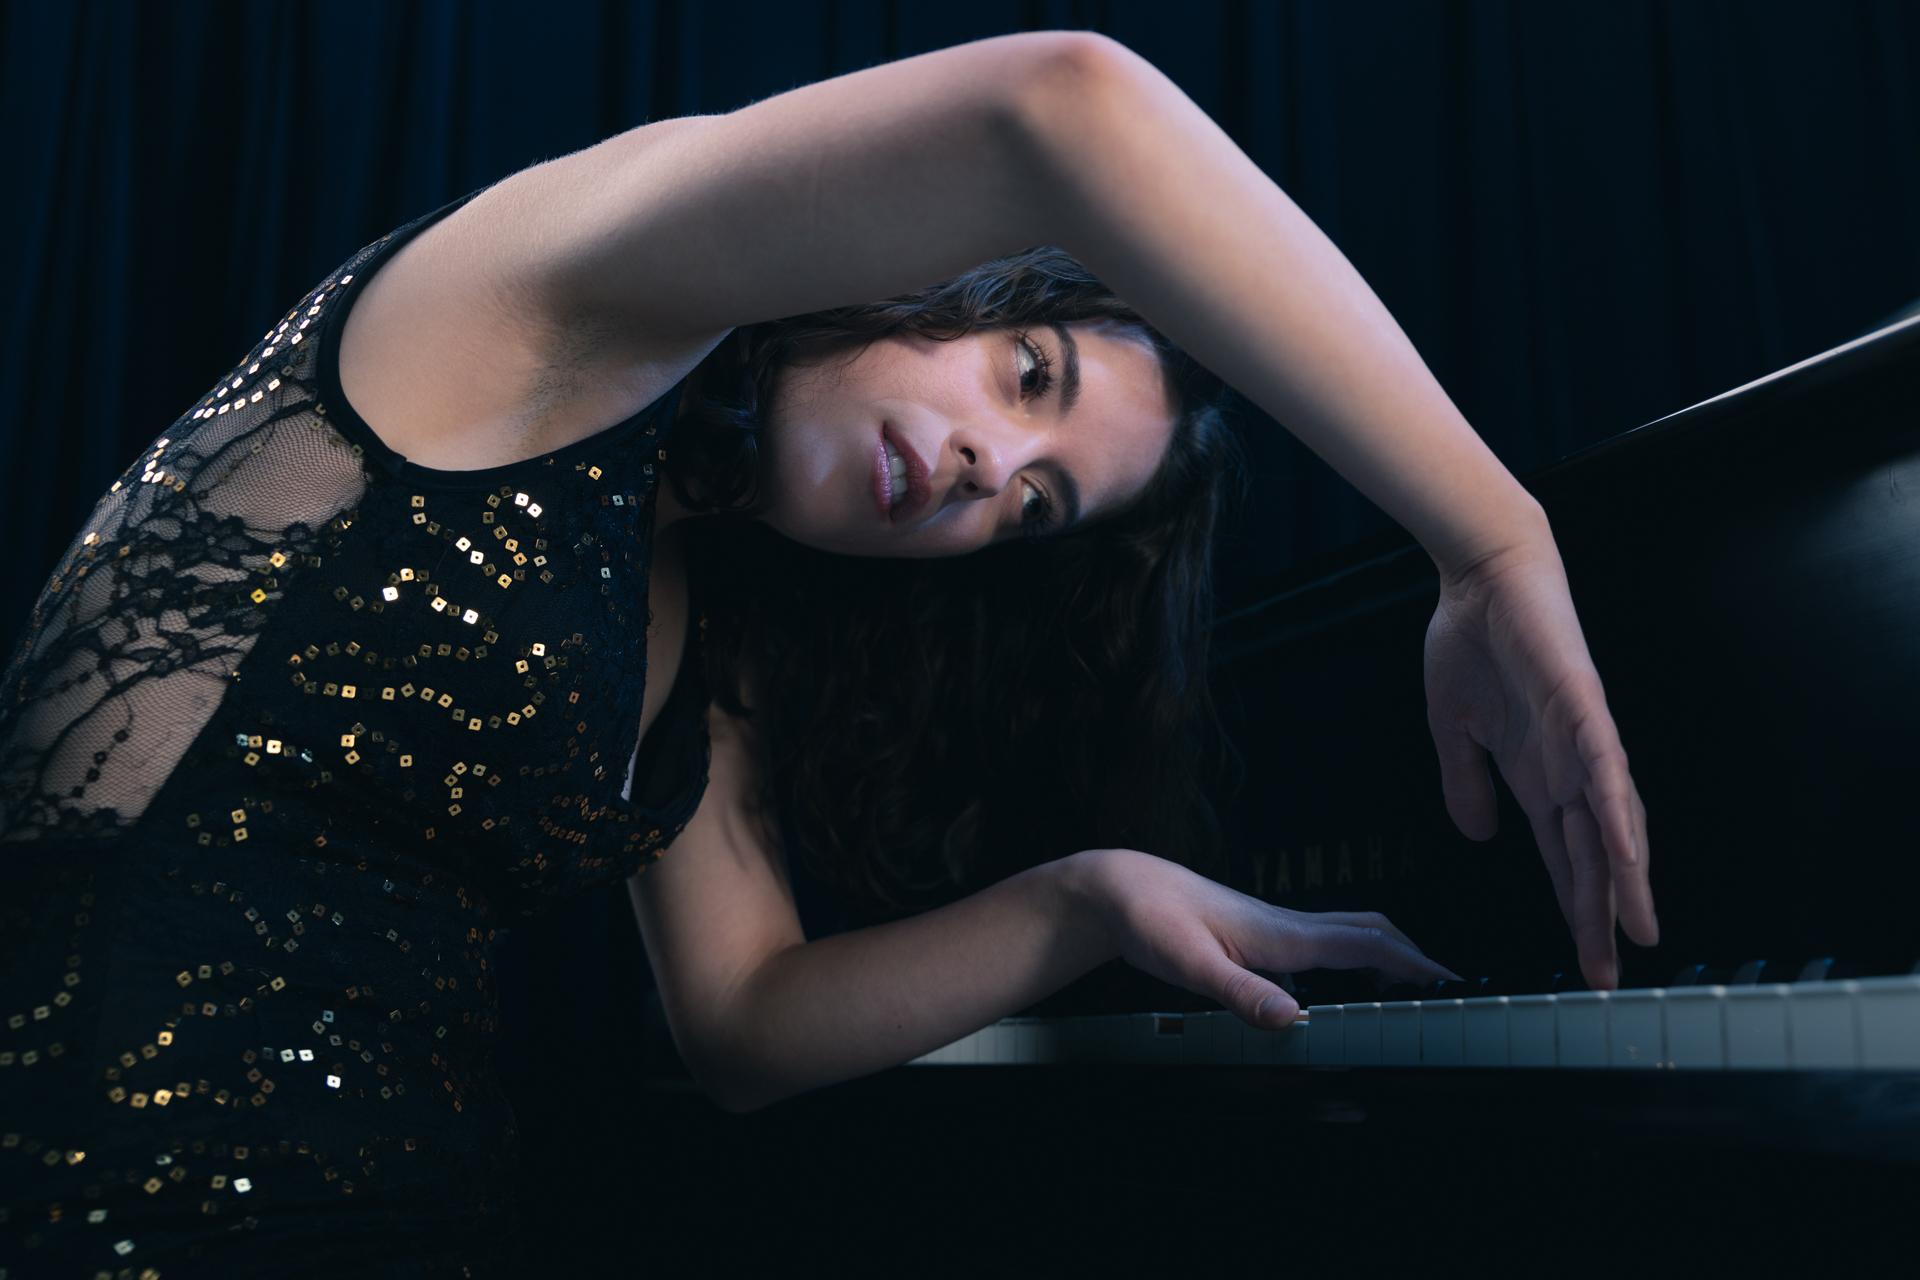 CFrenette-Julie au piano-12